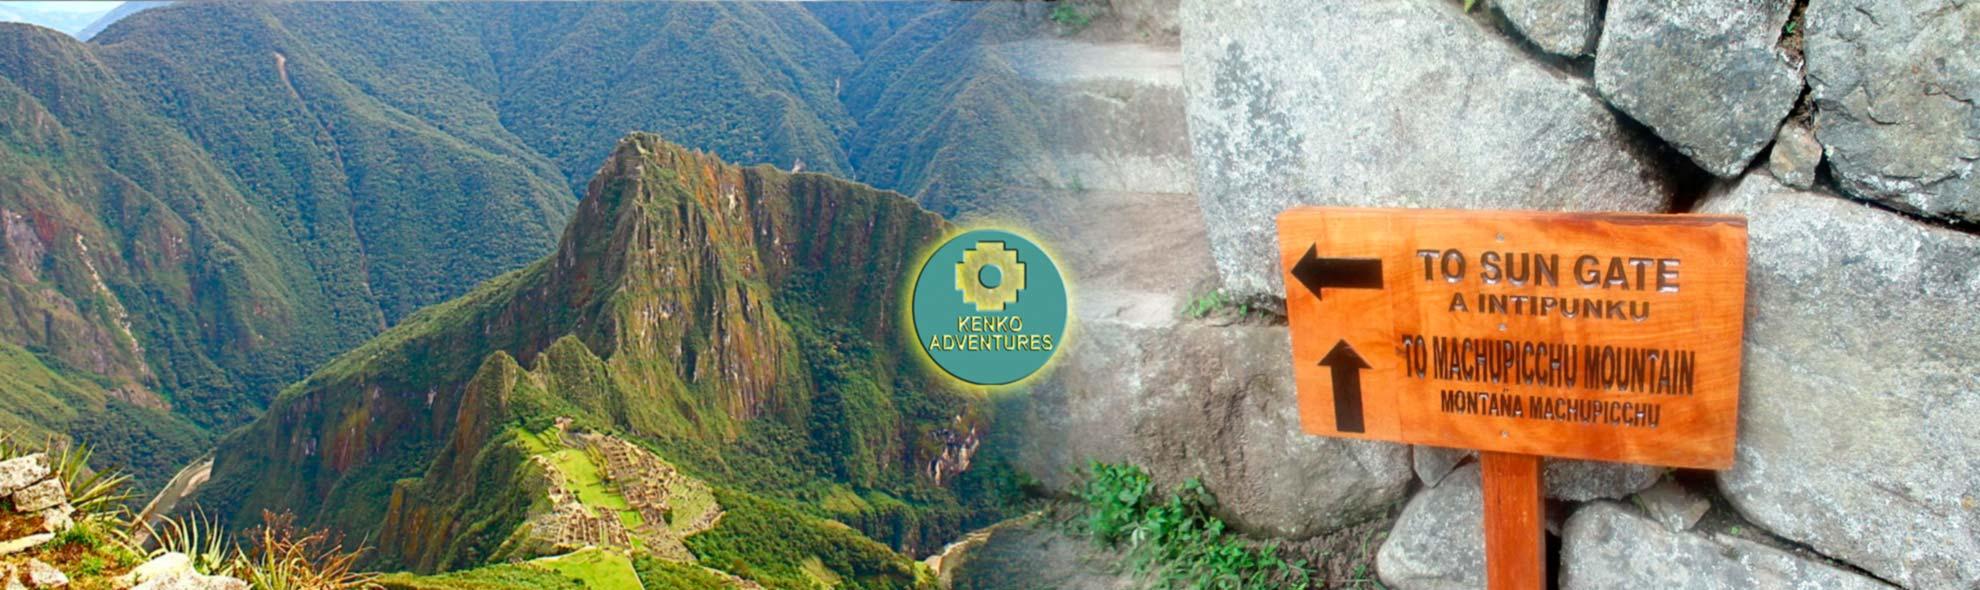 Machu Picchu Mountain Permits